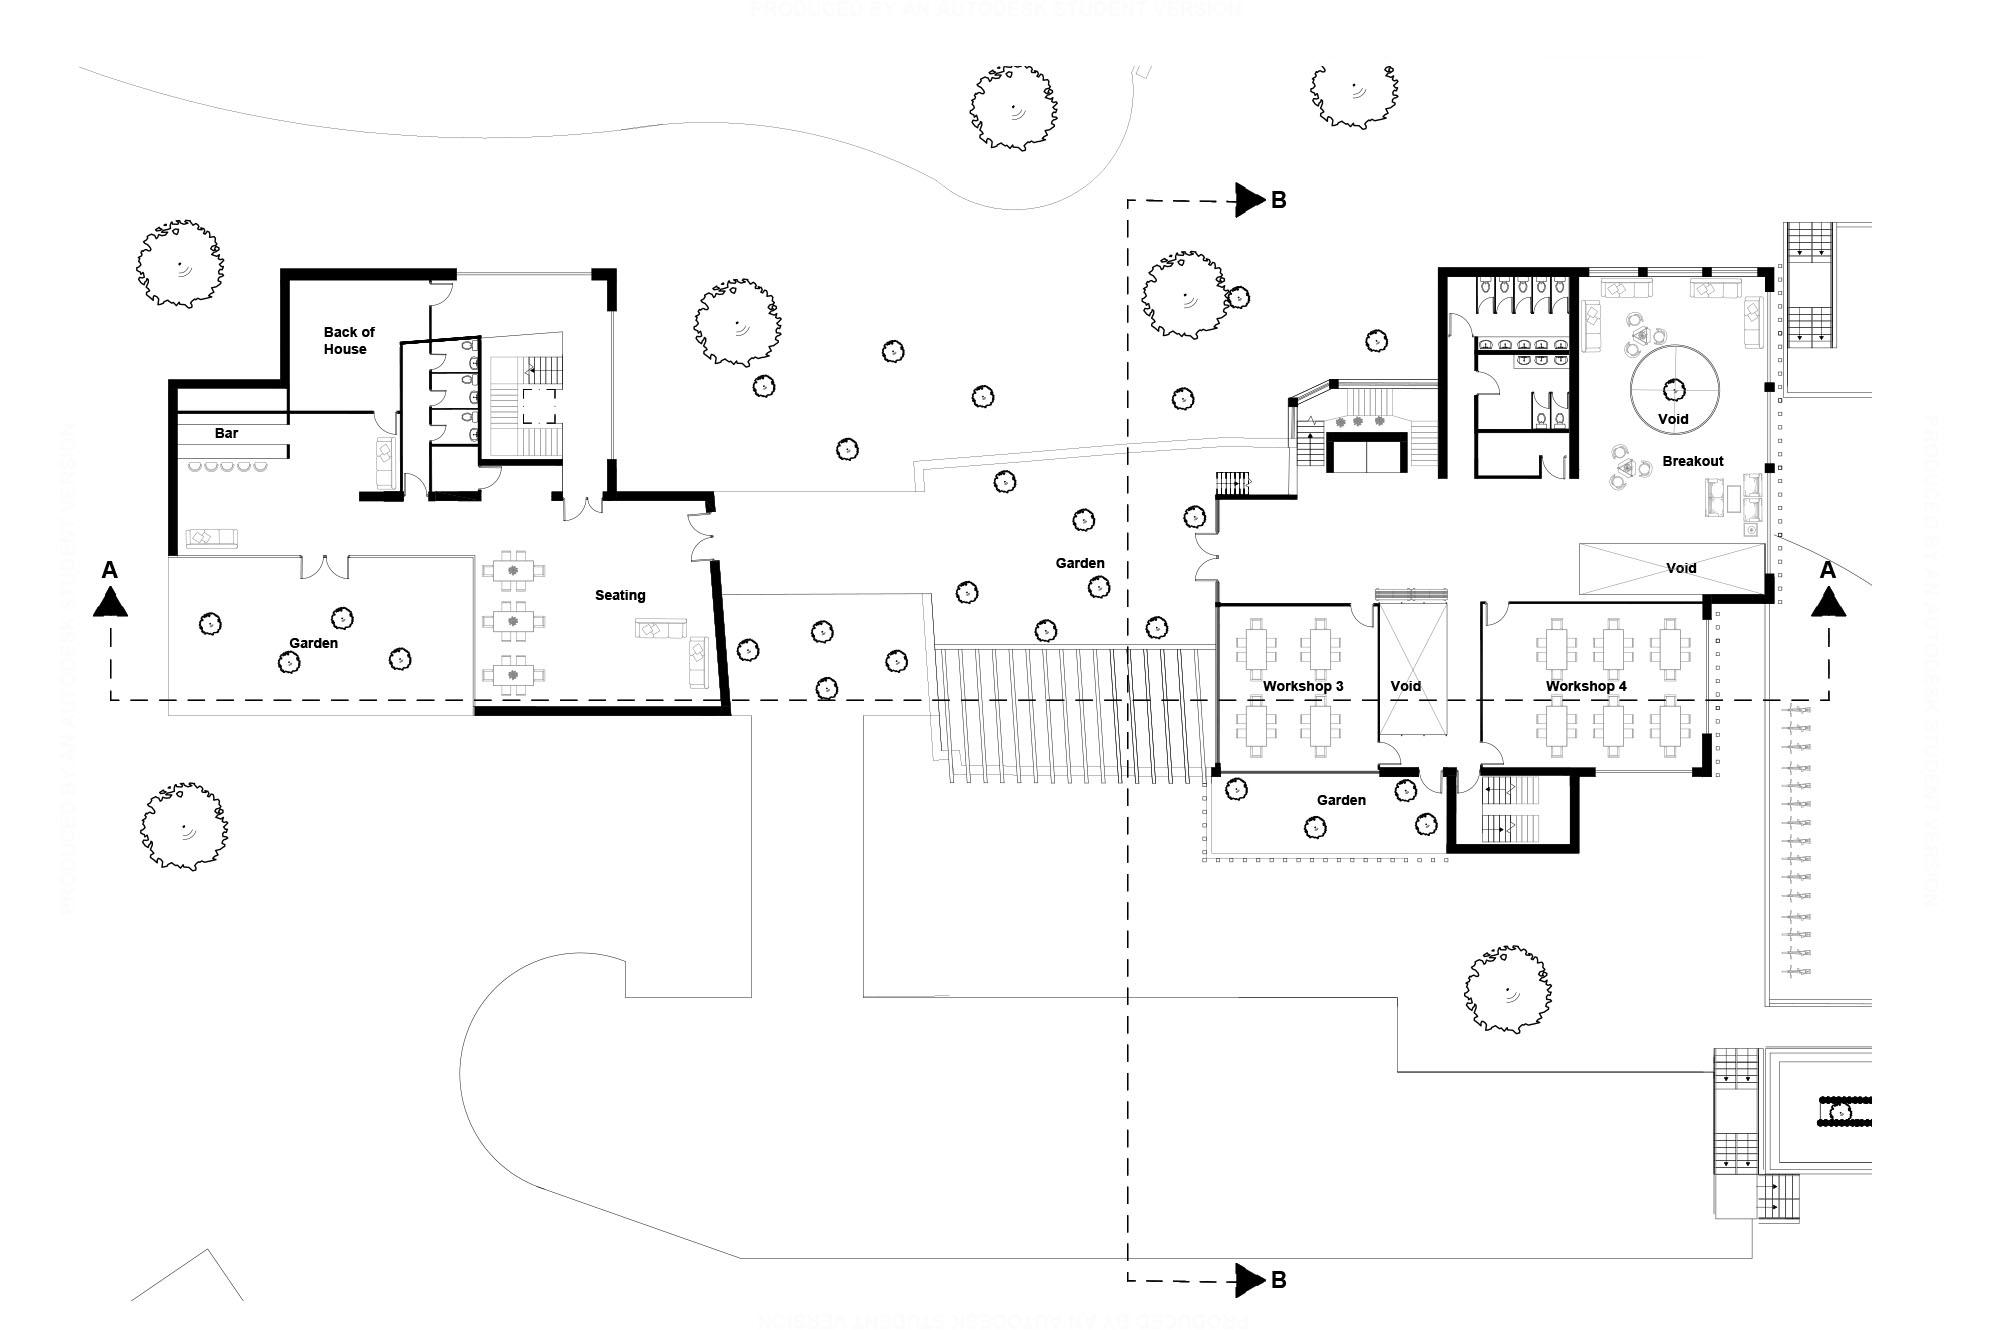 The Engine Second Floor Plan